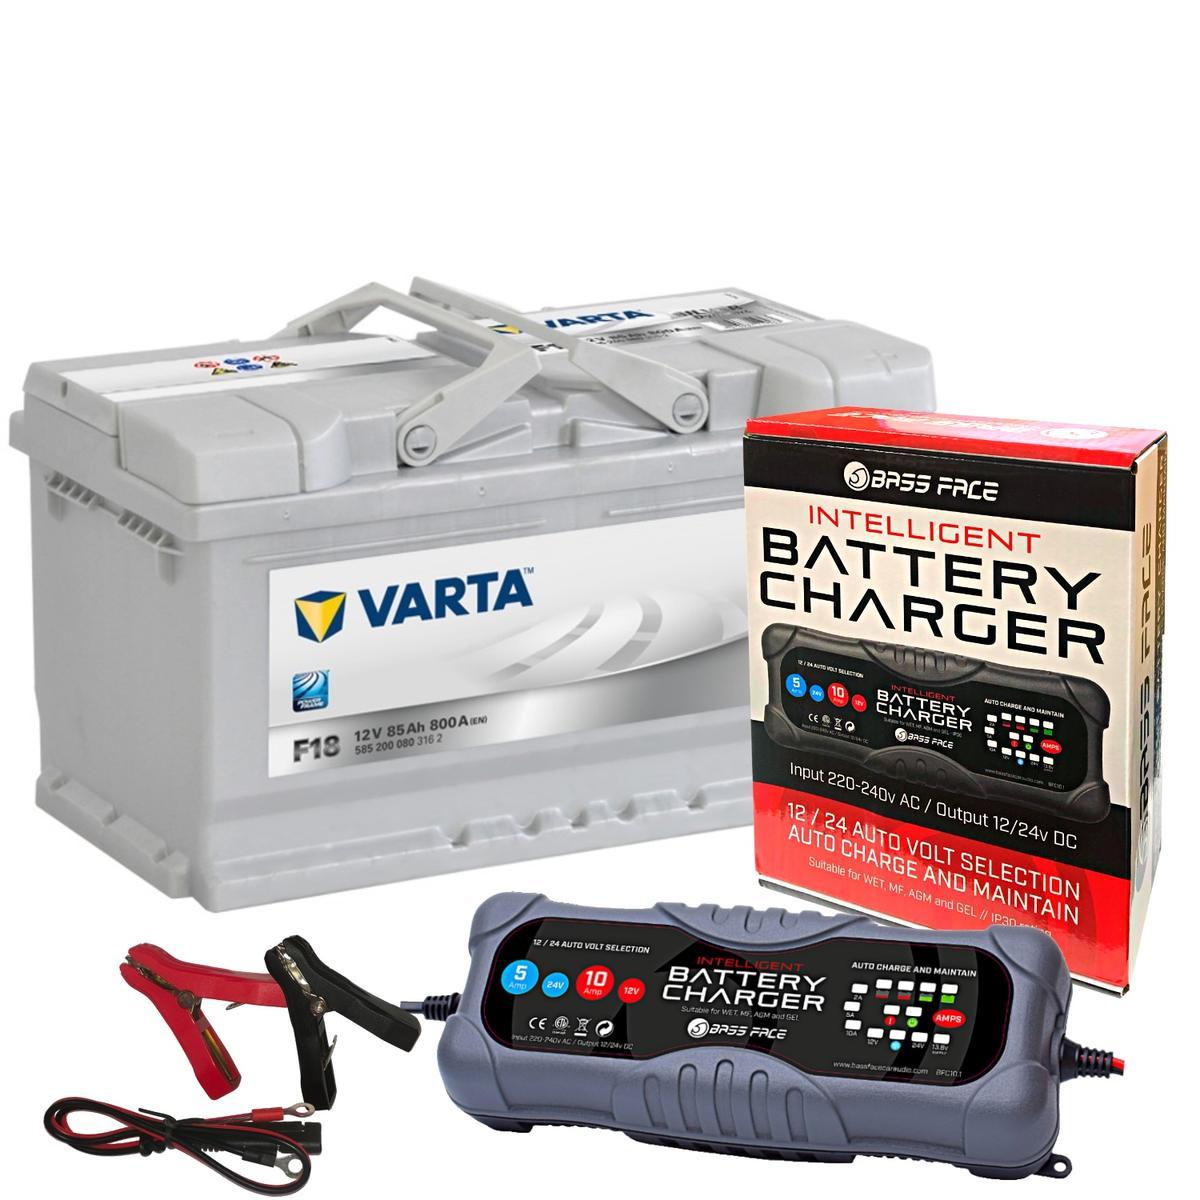 Varta F18 Audi Porsche Car Battery 12v 5 Year 110 85Ah 800CCA W/ 10 Amp Charger